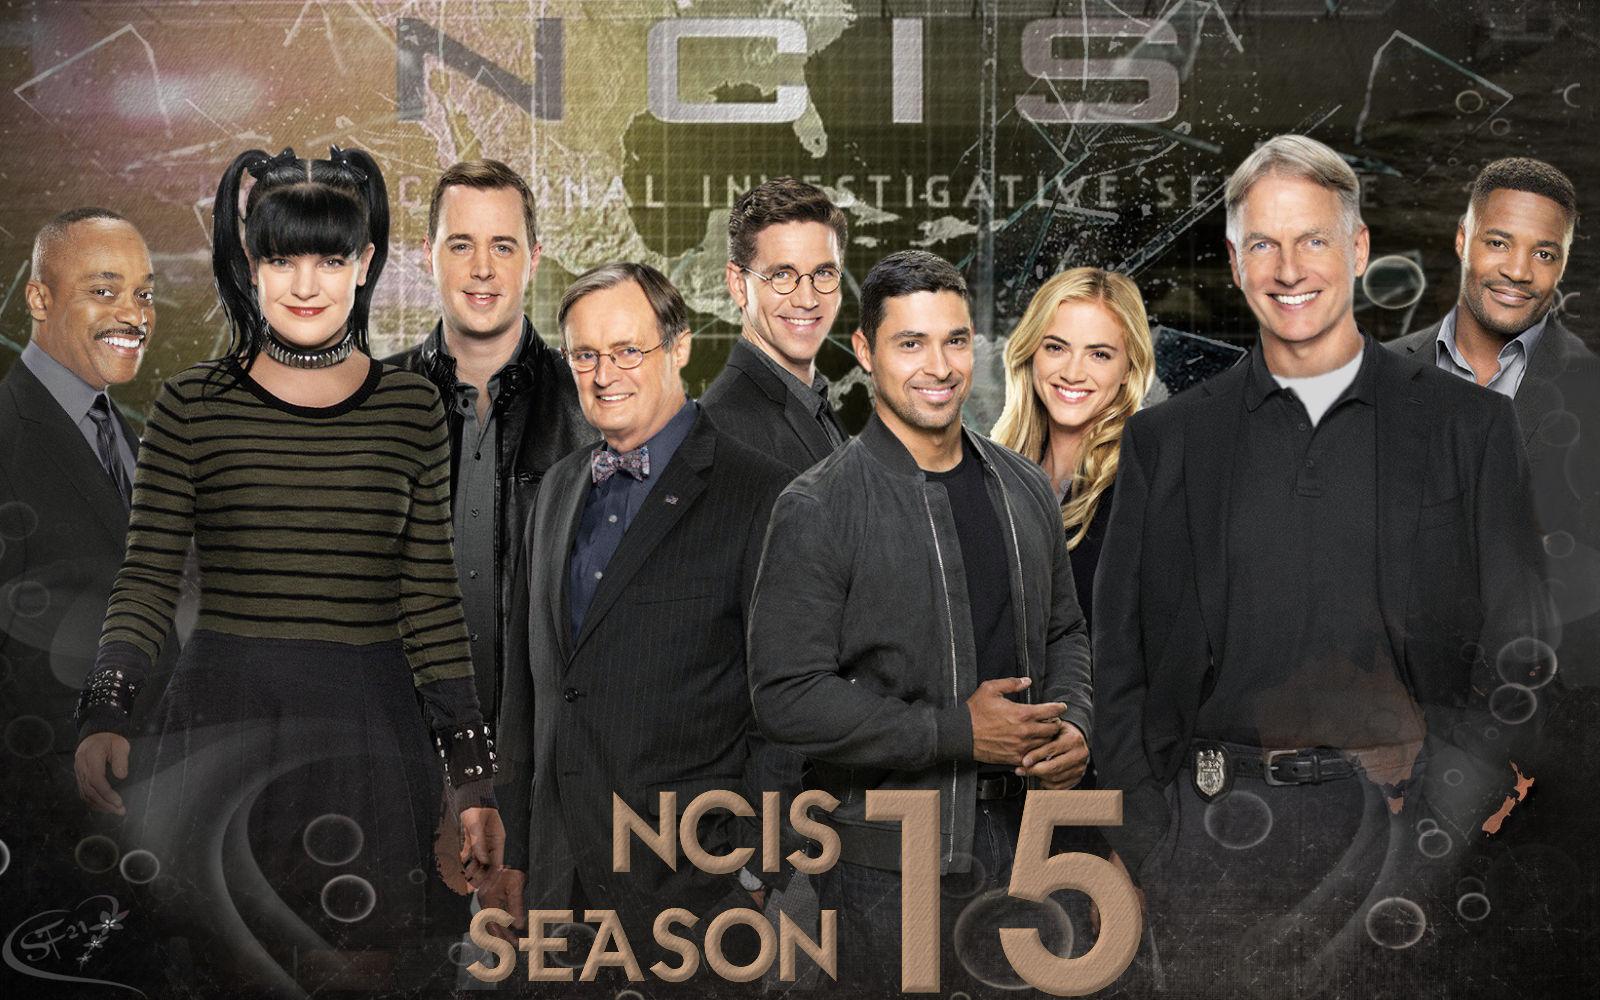 NCIS - Unità anticrimine Season 15